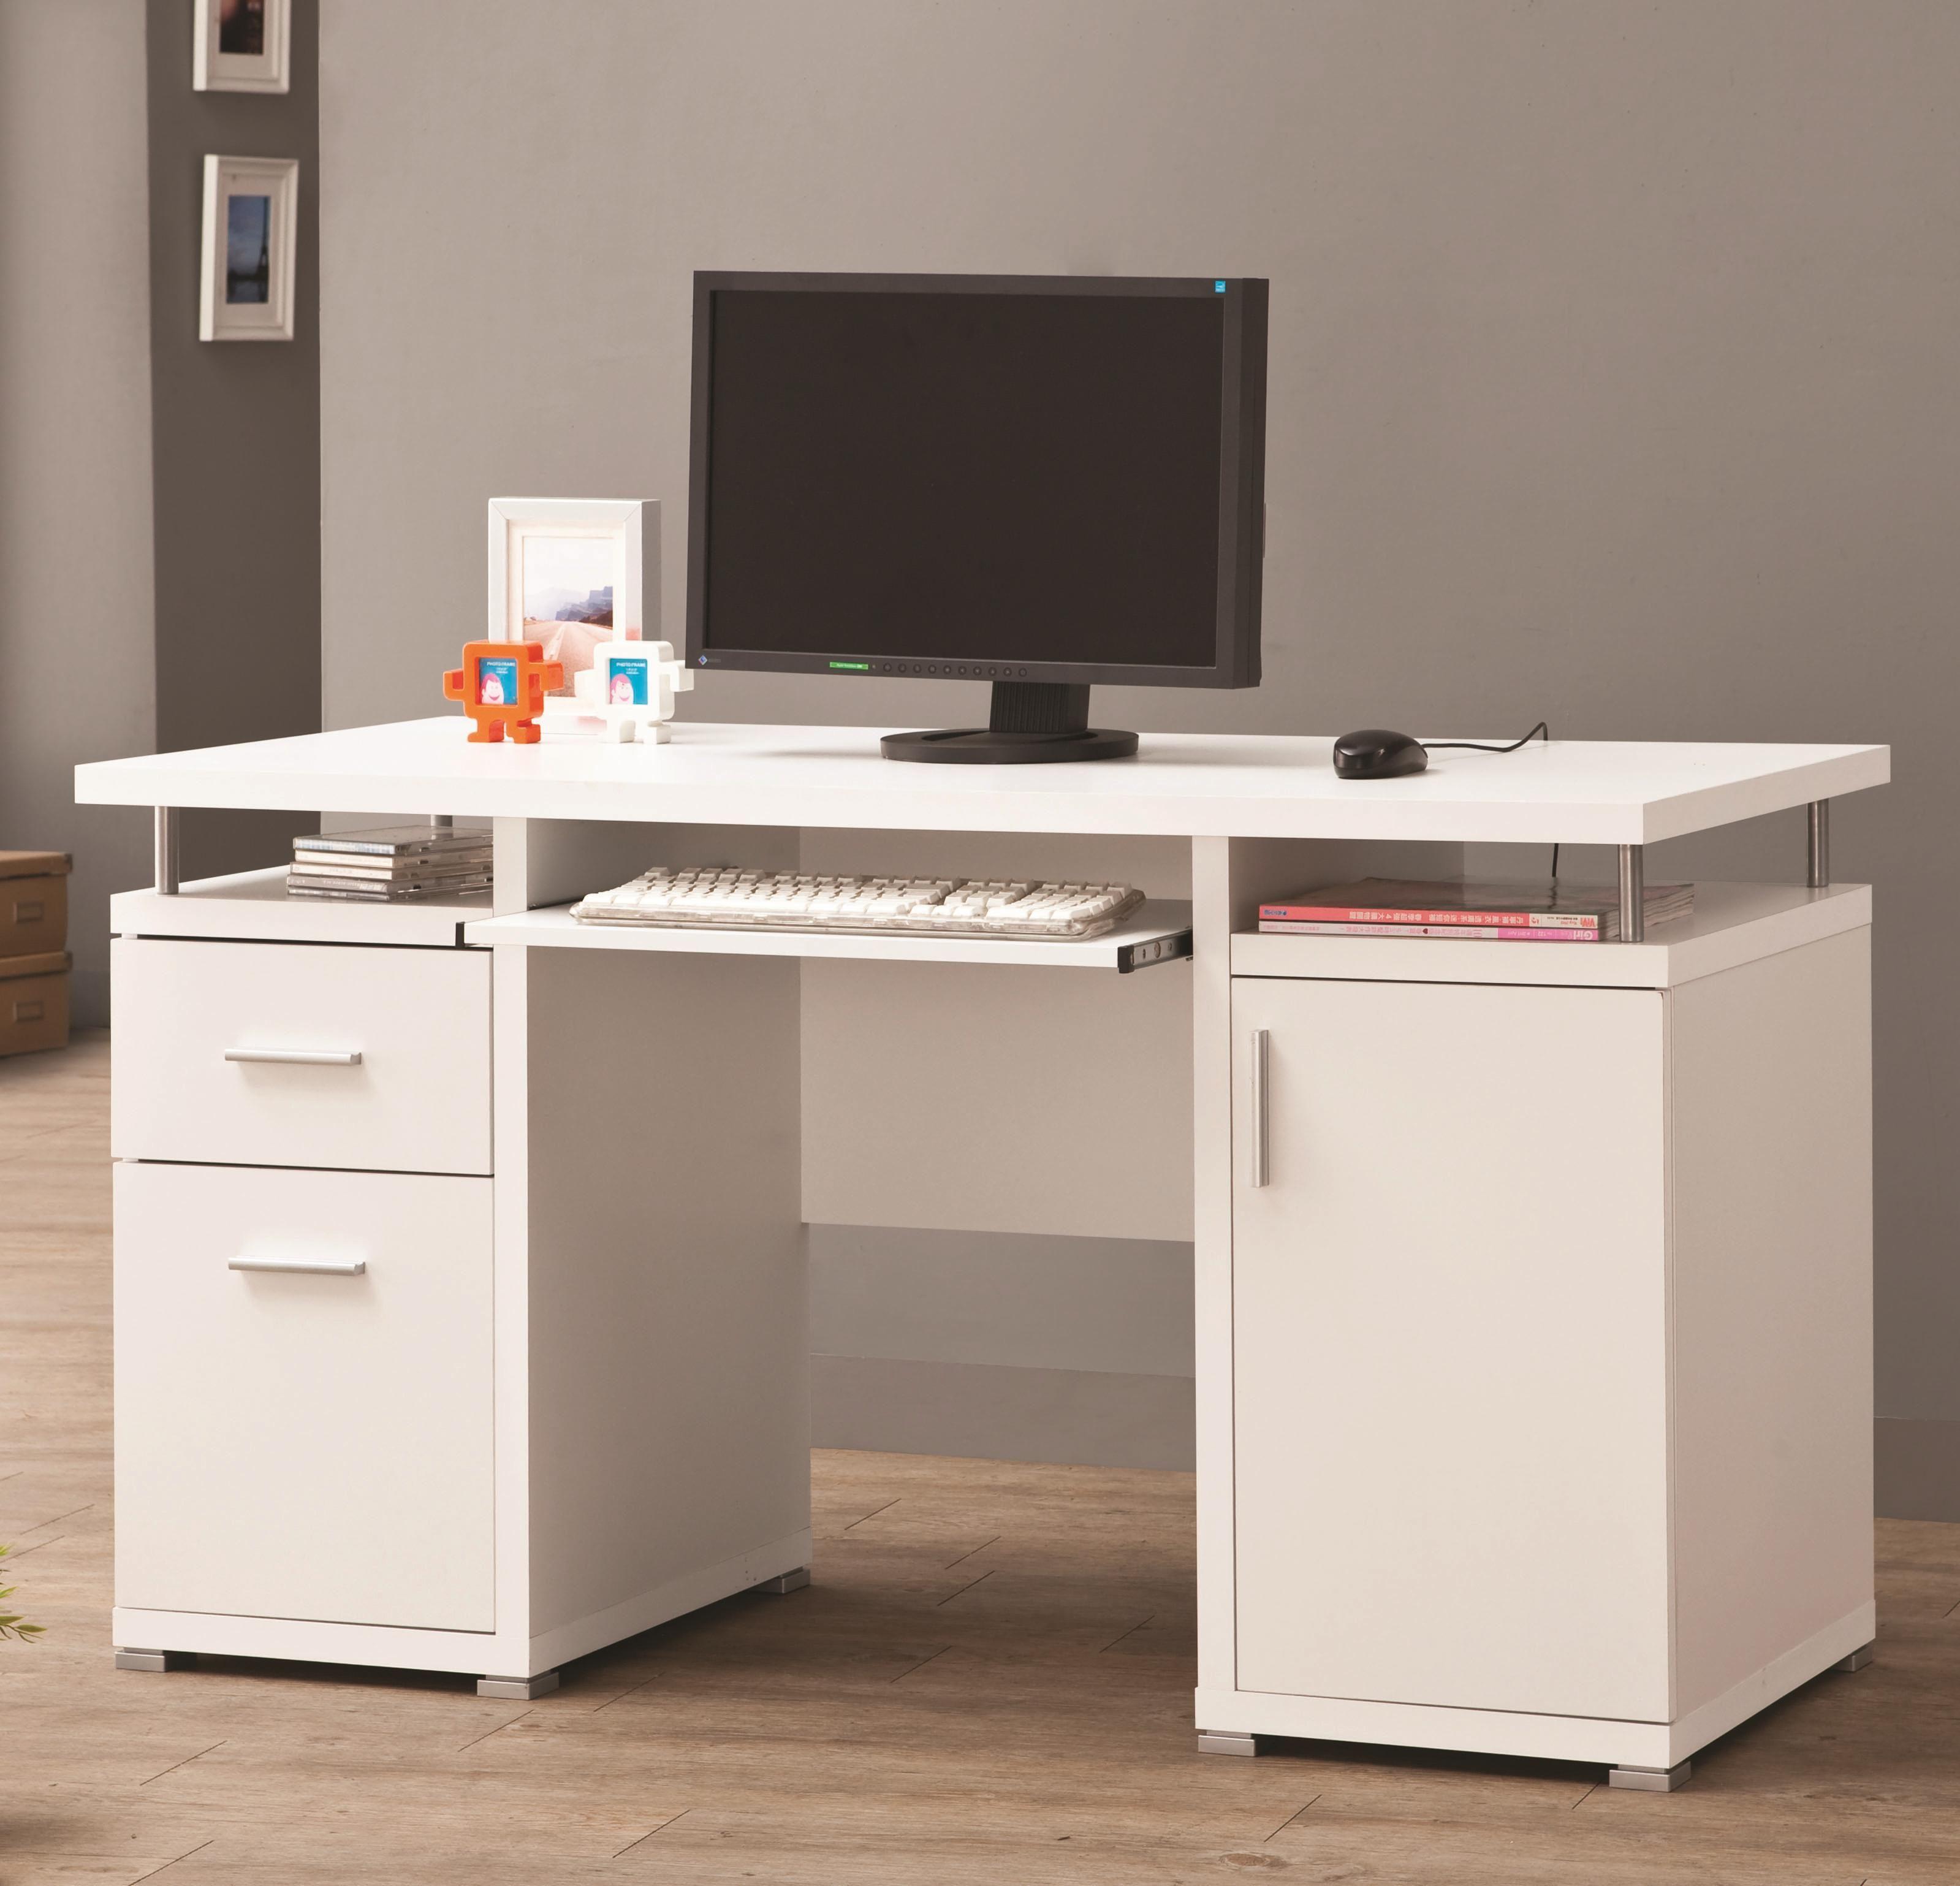 Coaster Desks White Computer Desk With 2 Drawers U0026 Cabinet   Coaster Fine  Furniture